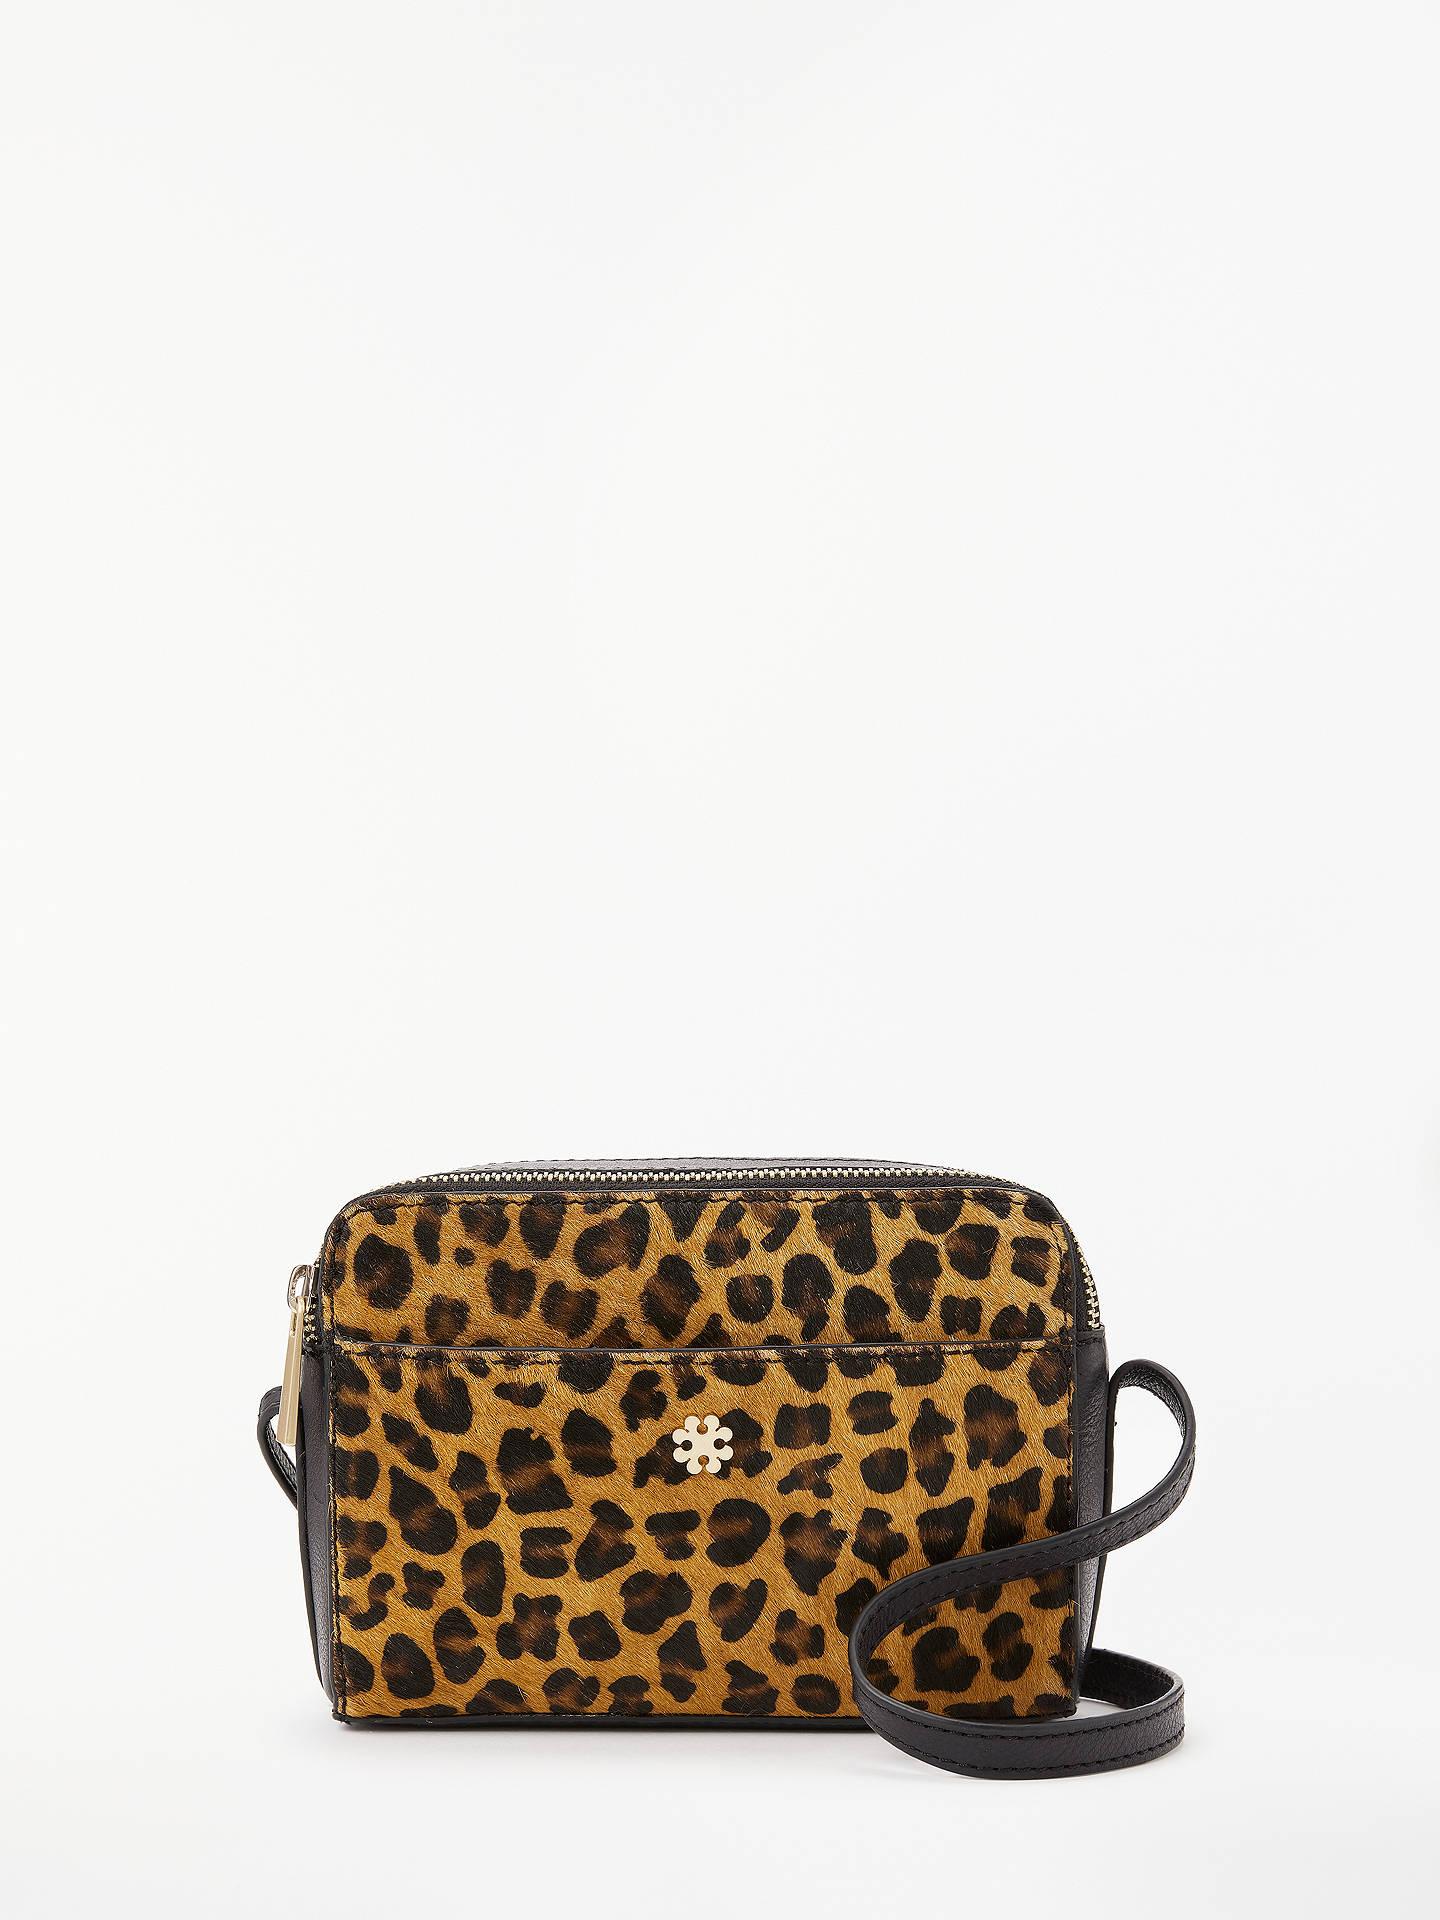 4595a8e6 Buy DAY BIRGER ET MIKKELSEN Day Must Leo Leather Cross Body Bag,  Leopard/Black ...